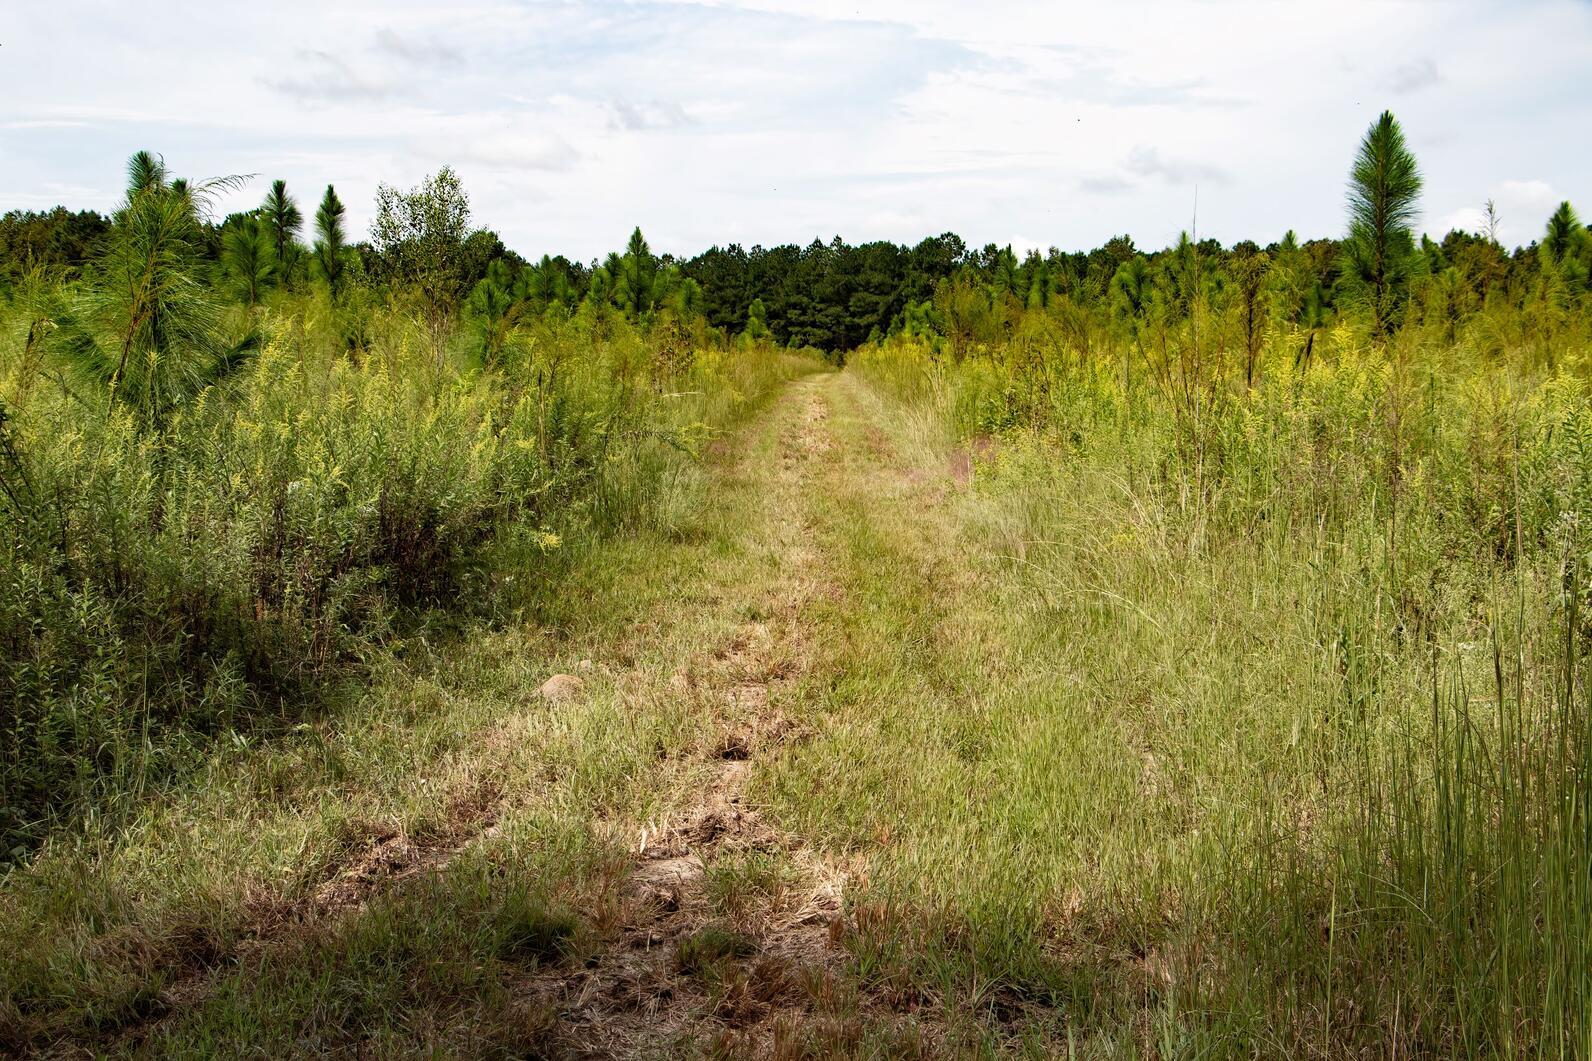 New Grassland-Woodland Trails at Beidler Forest